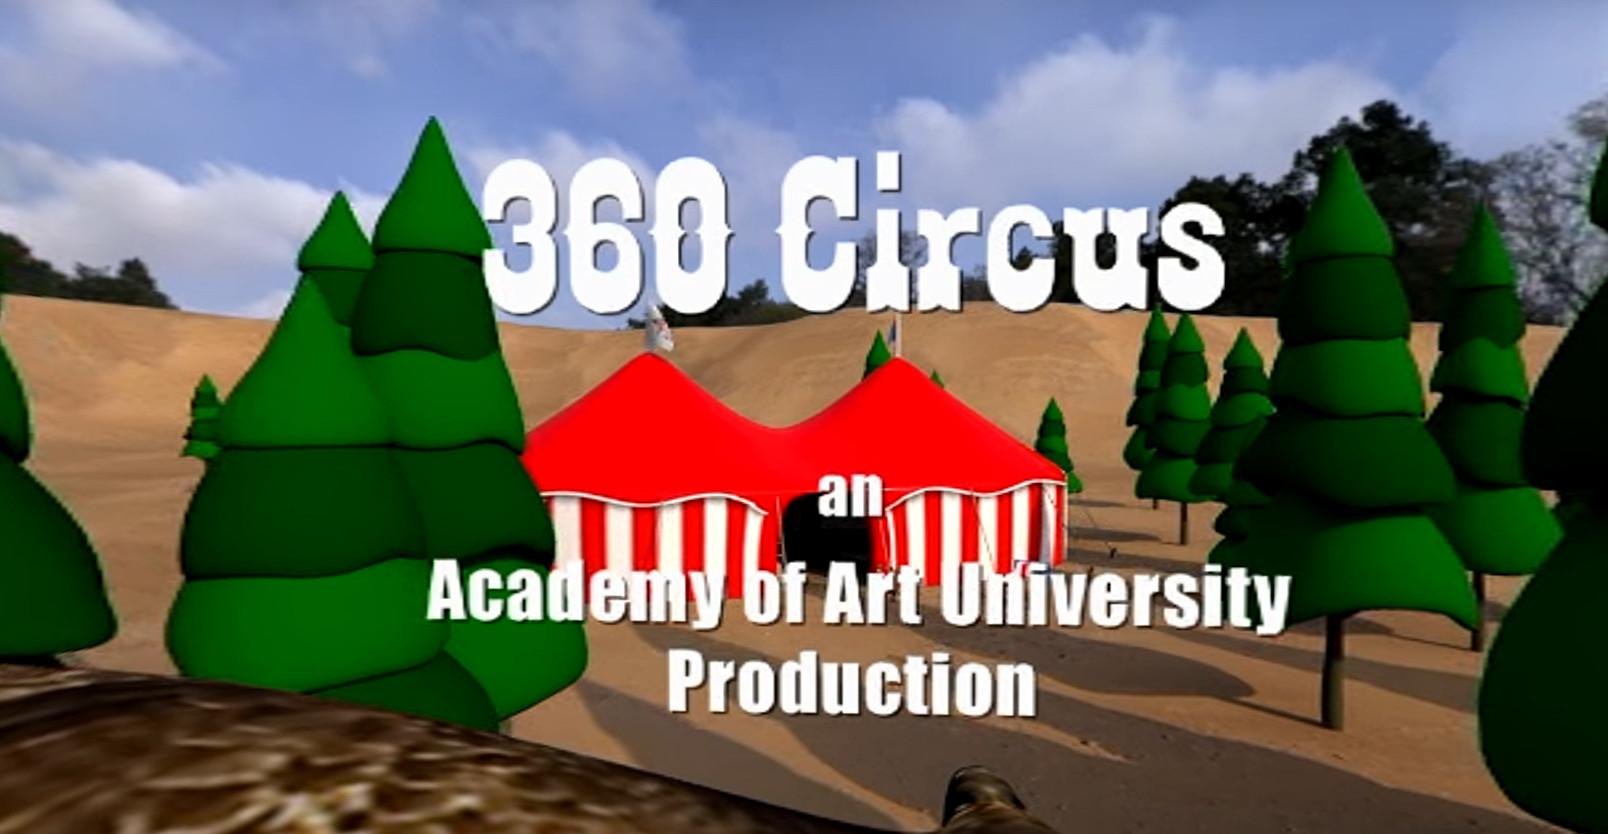 360_circus_title.jpg